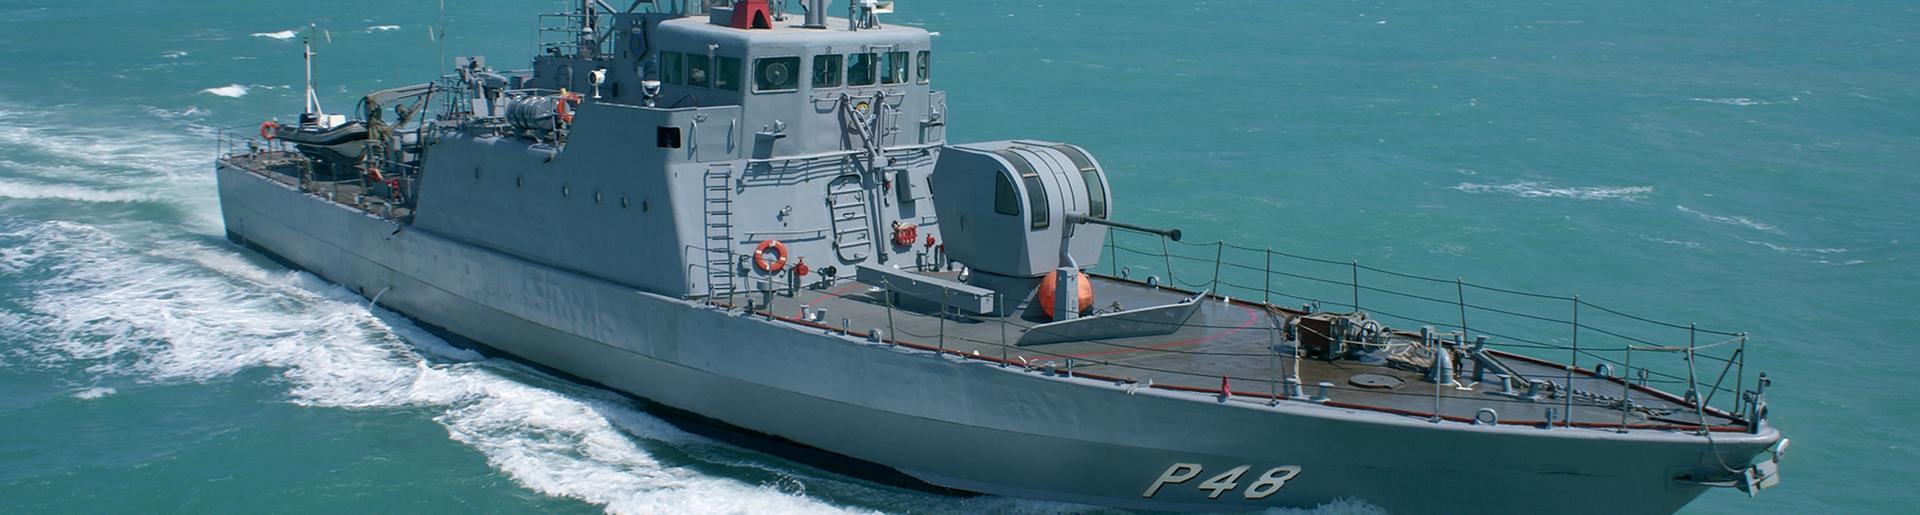 https://www.marinha.mil.br/emgepron/pt-br/areas/construcao-naval